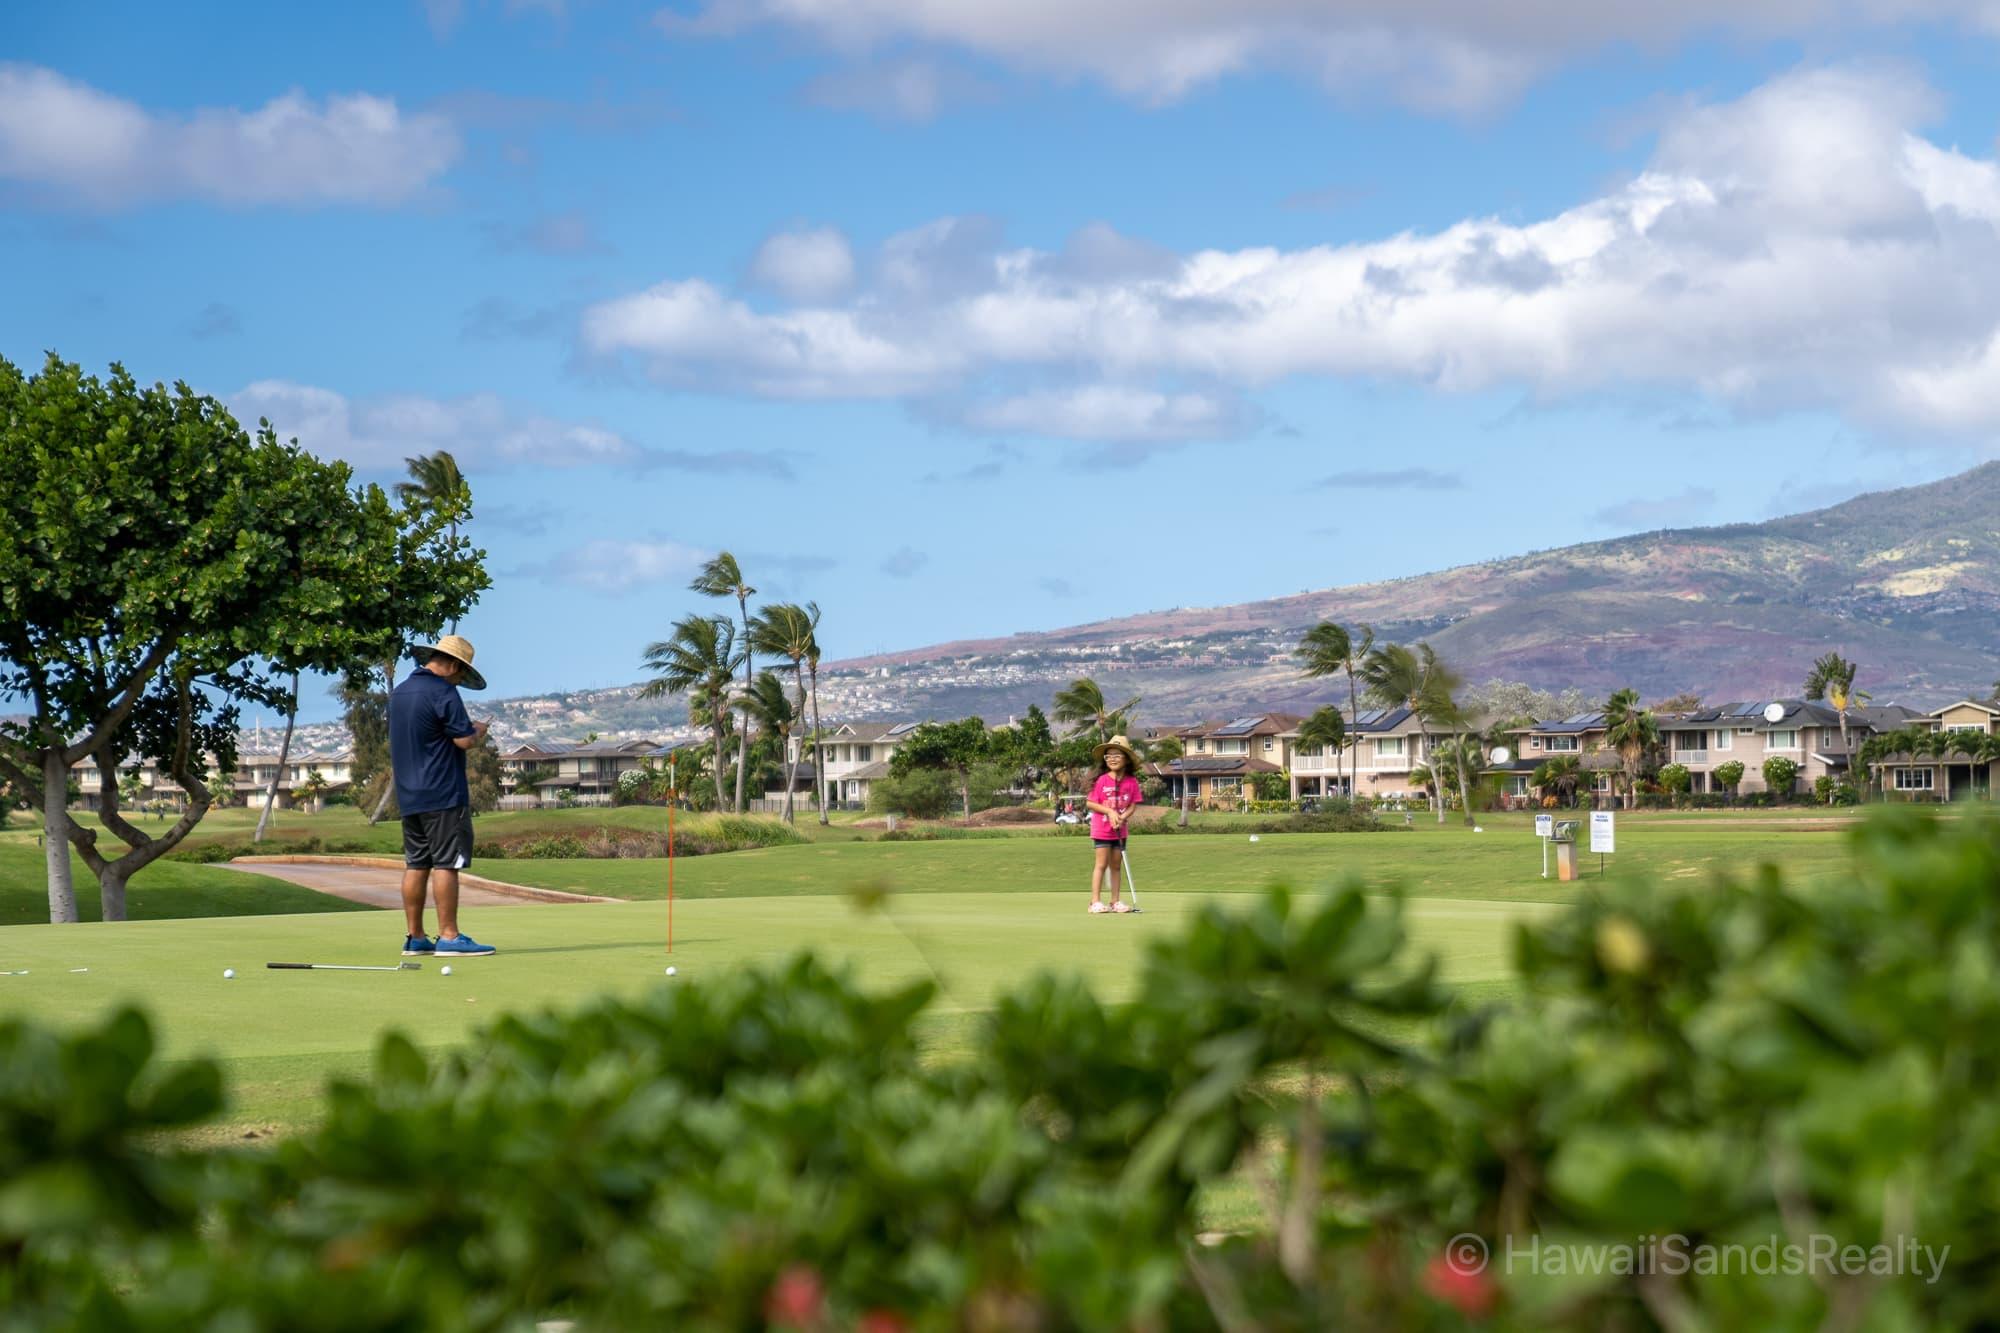 Ewa Gentry Golf Course